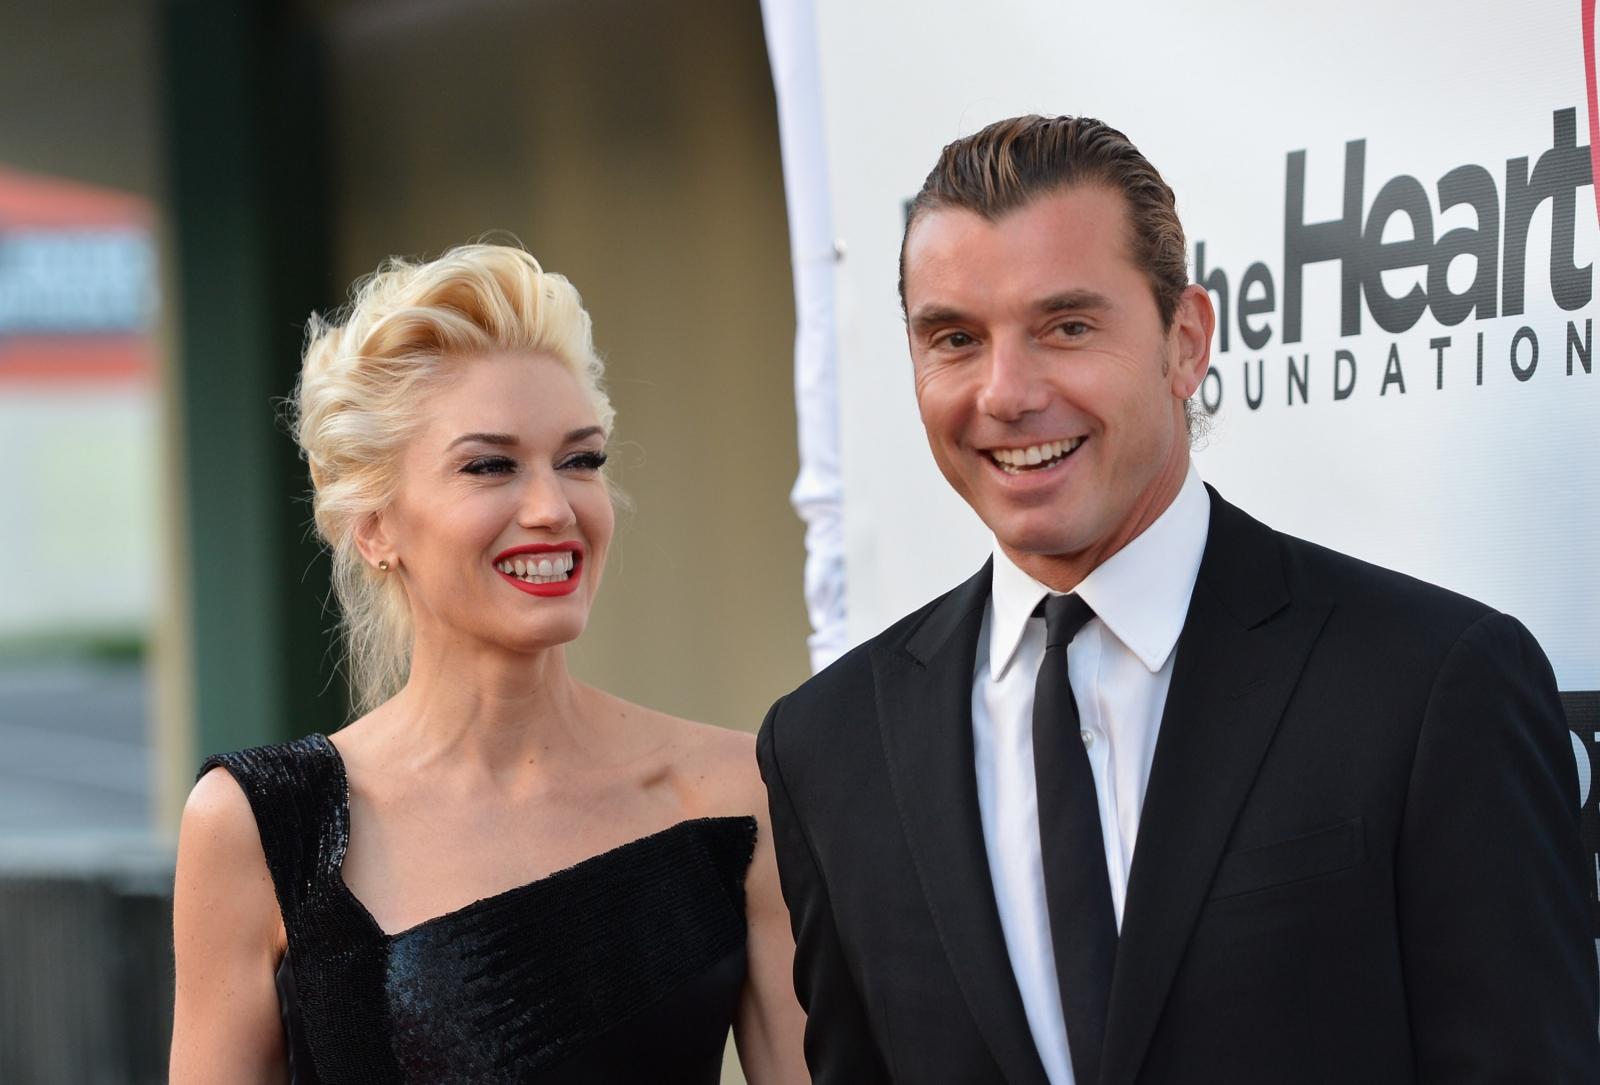 Gwen Stefani's ex husband Gavin Rossdale reveals he wrote depressing songs after 'painful' divorce